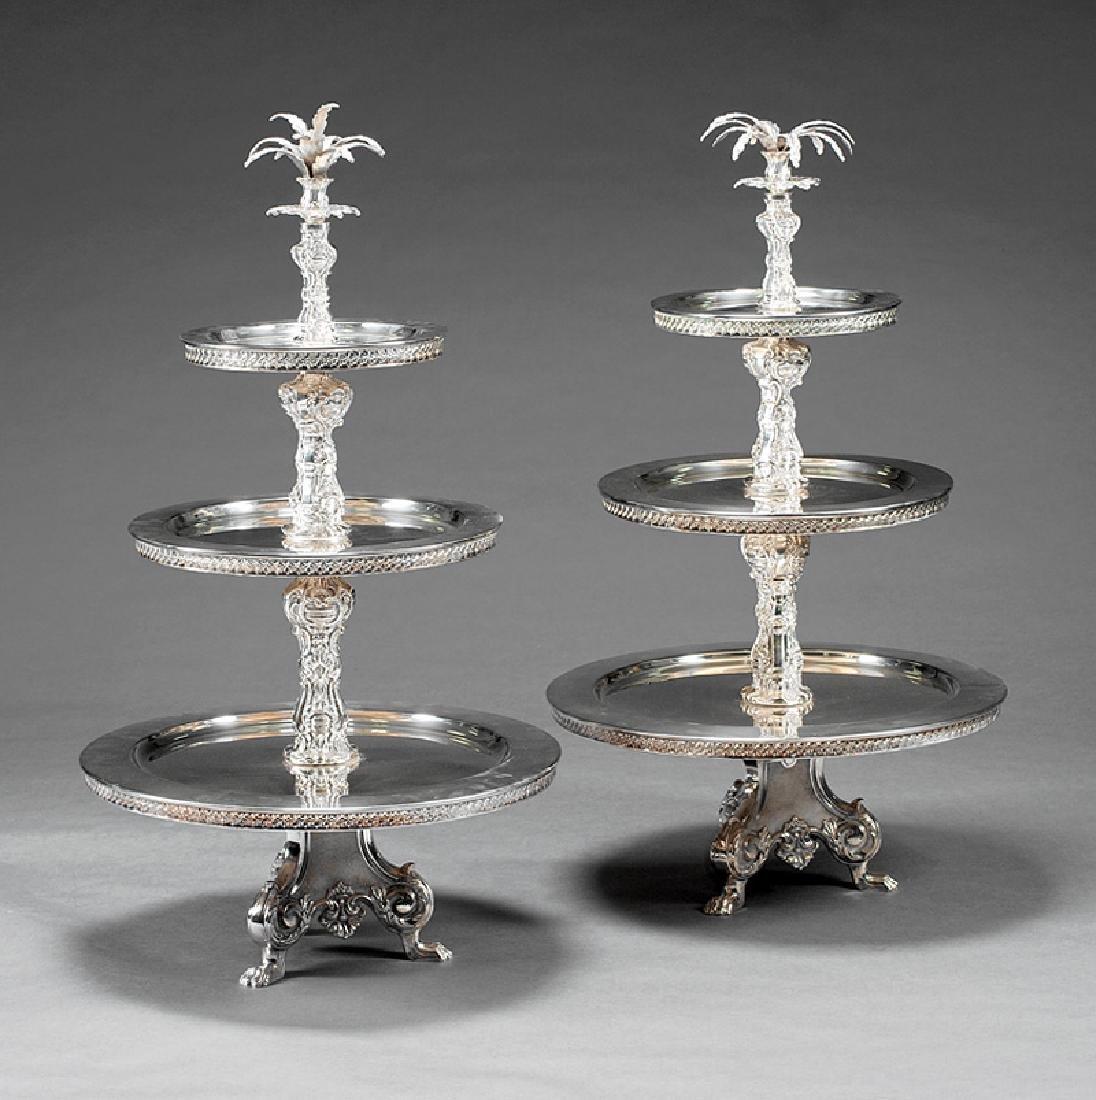 Pair of Silverplate Three-Tier Dessert Stands